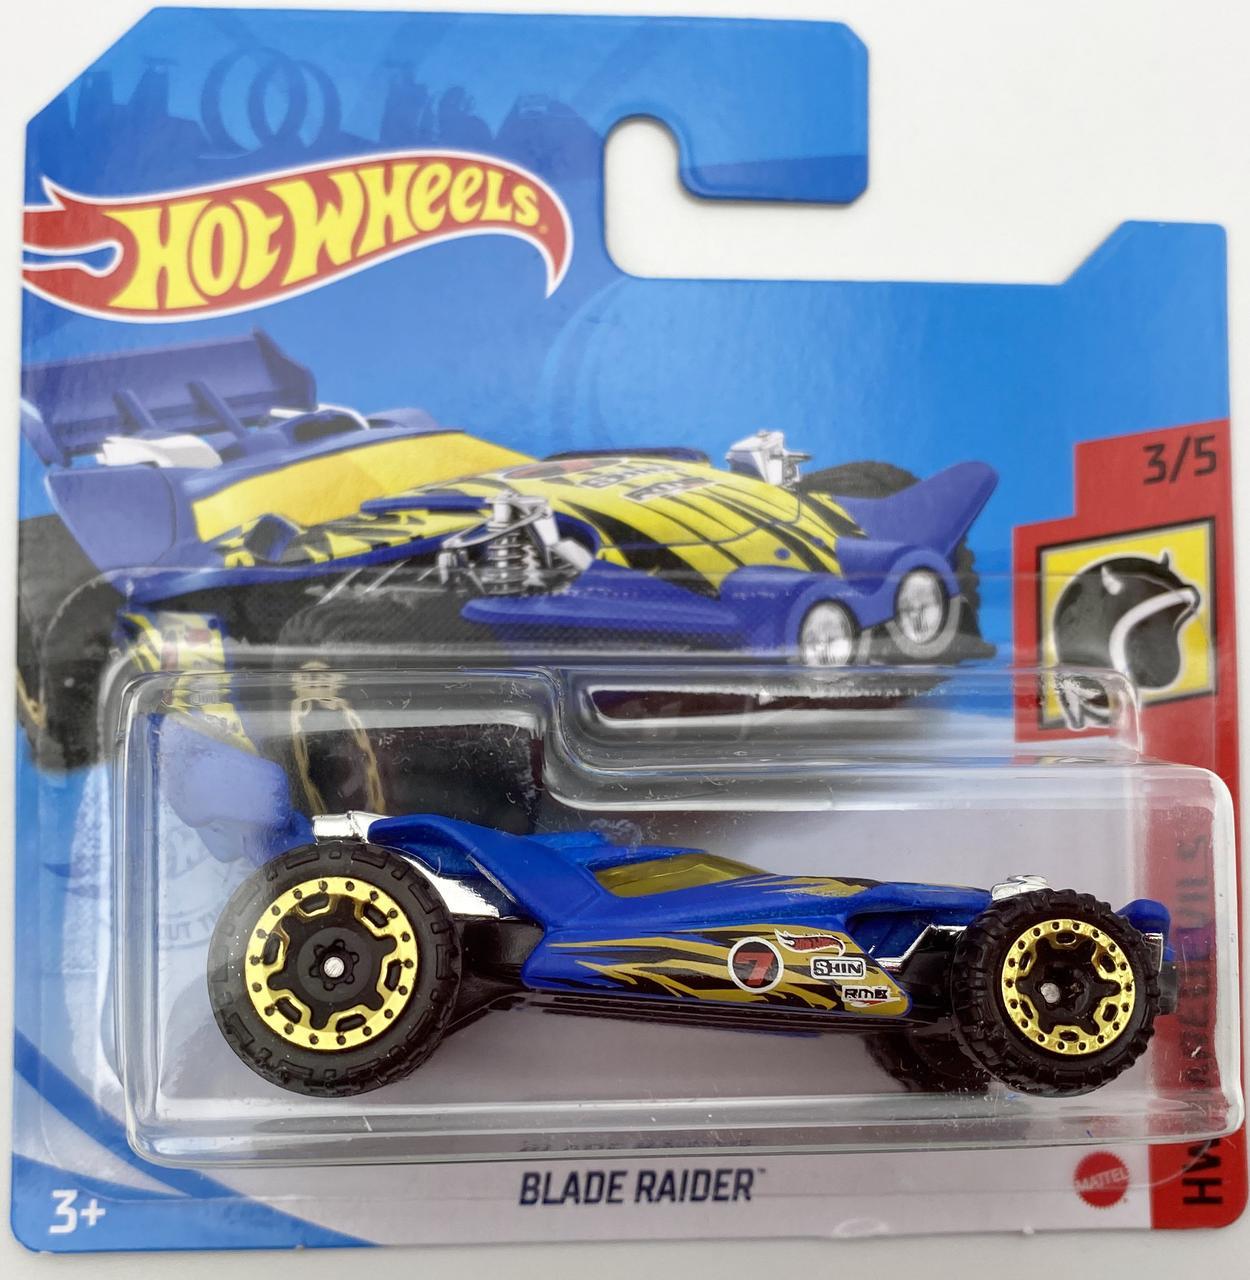 Базовая металлическая машинка Хот Вилс Hot Wheels Blade Raider car оригинал Mattel Уценка